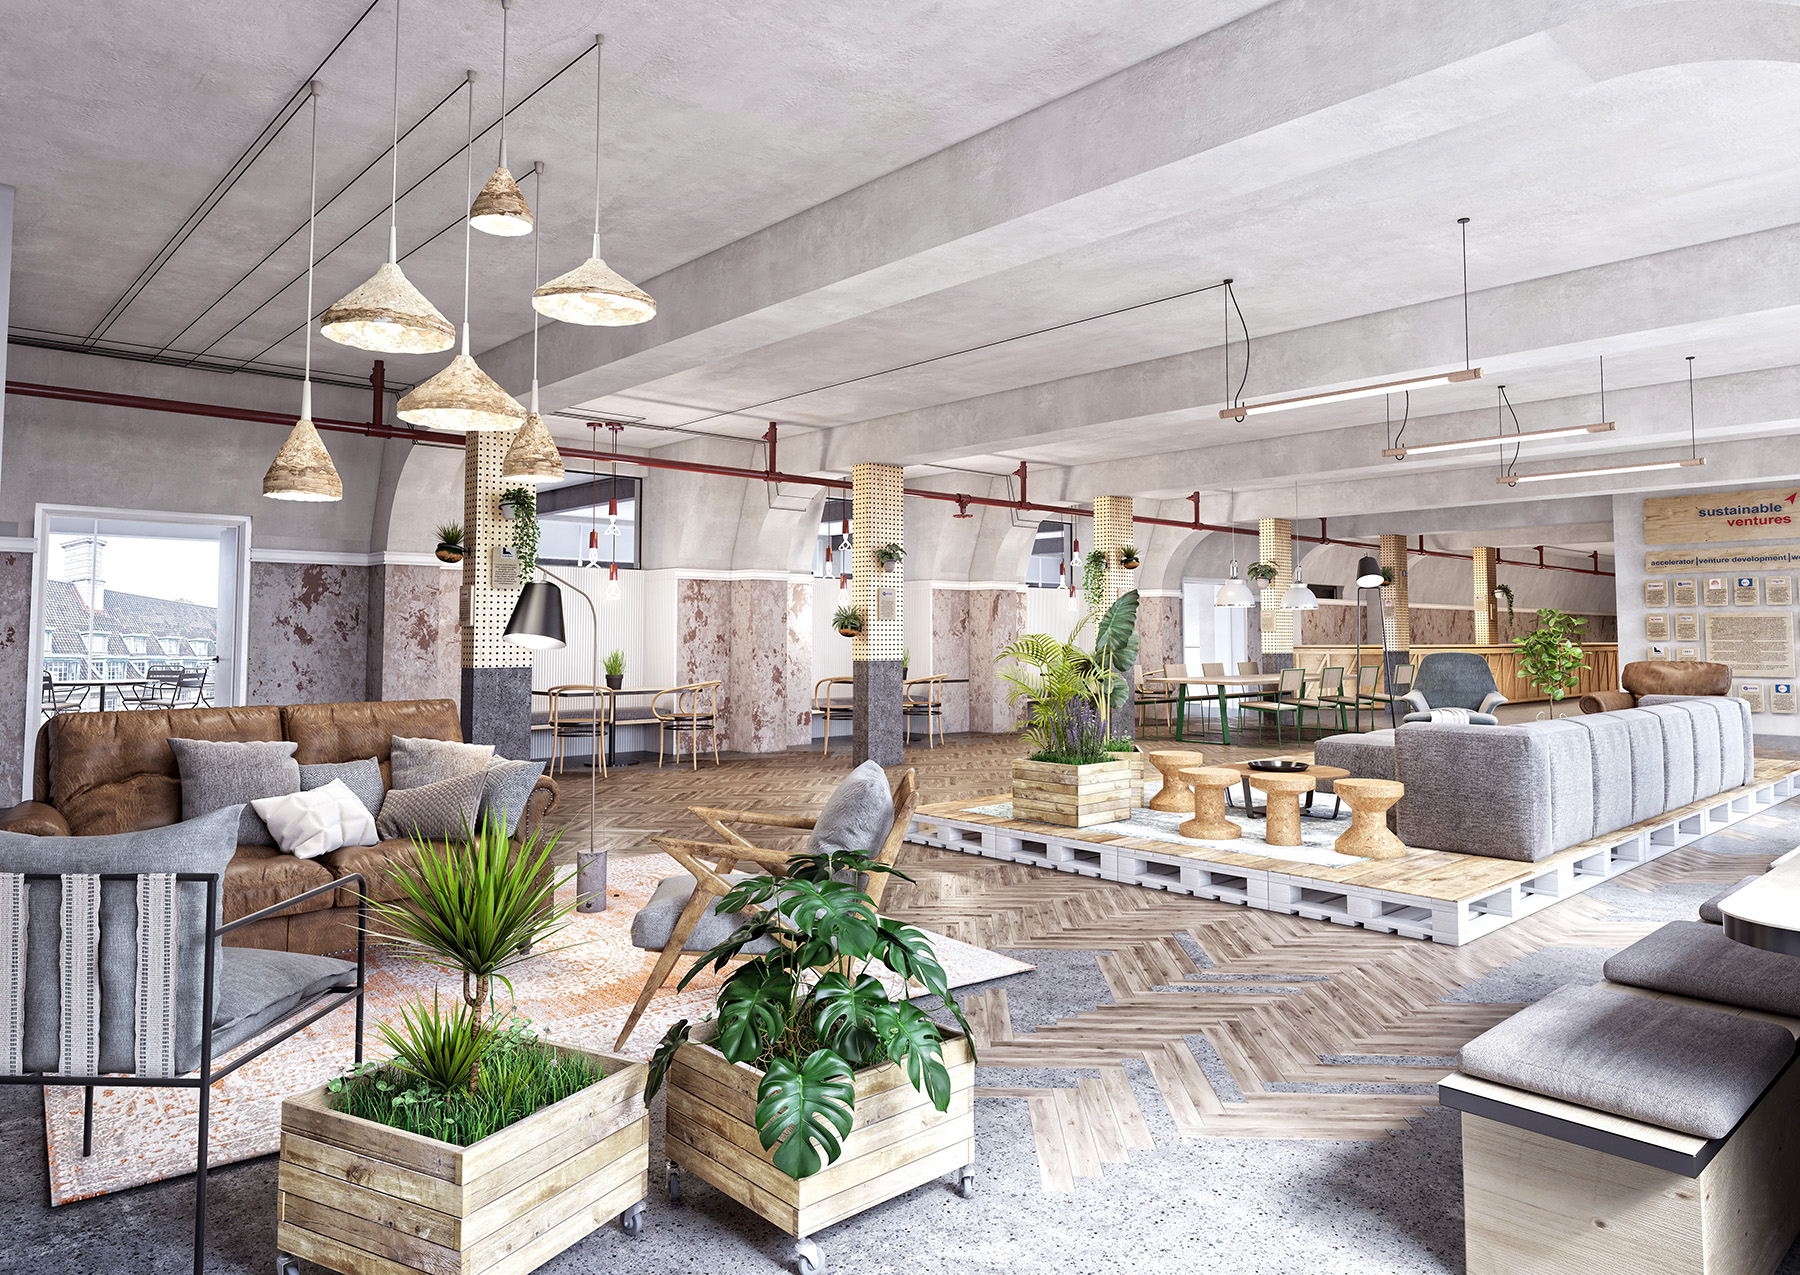 Sustainable Ventures office design